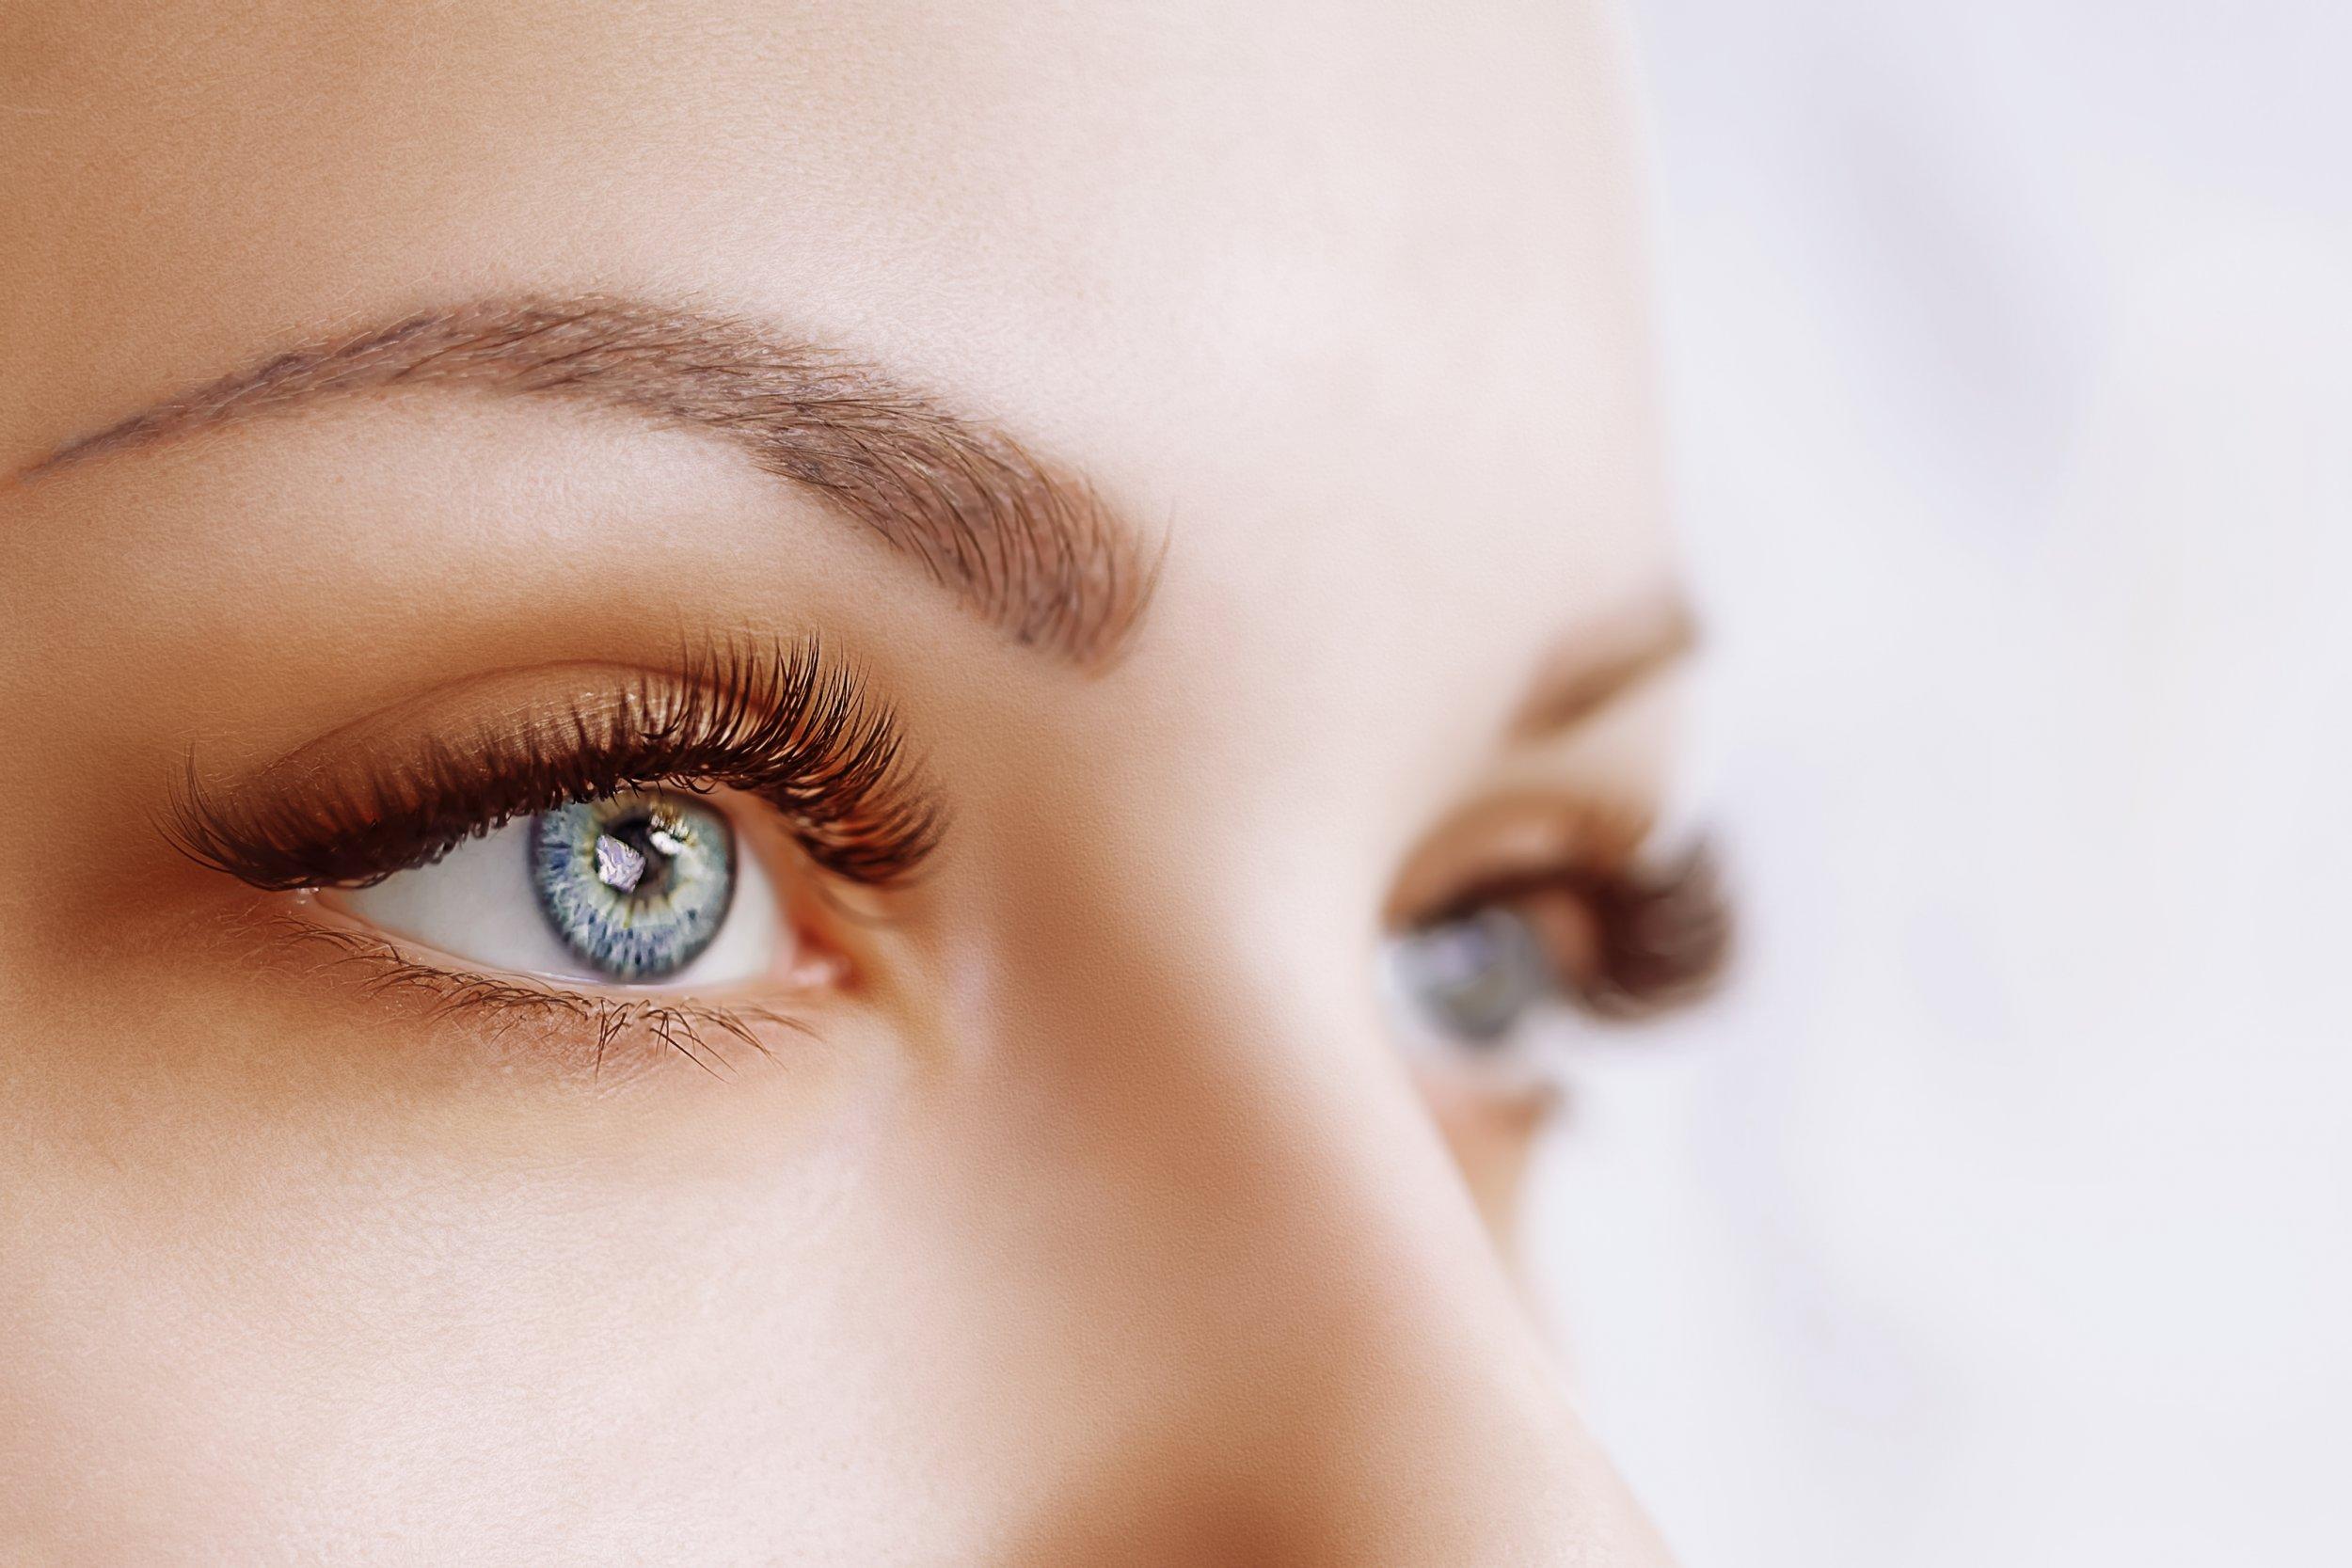 woman's face, eyes